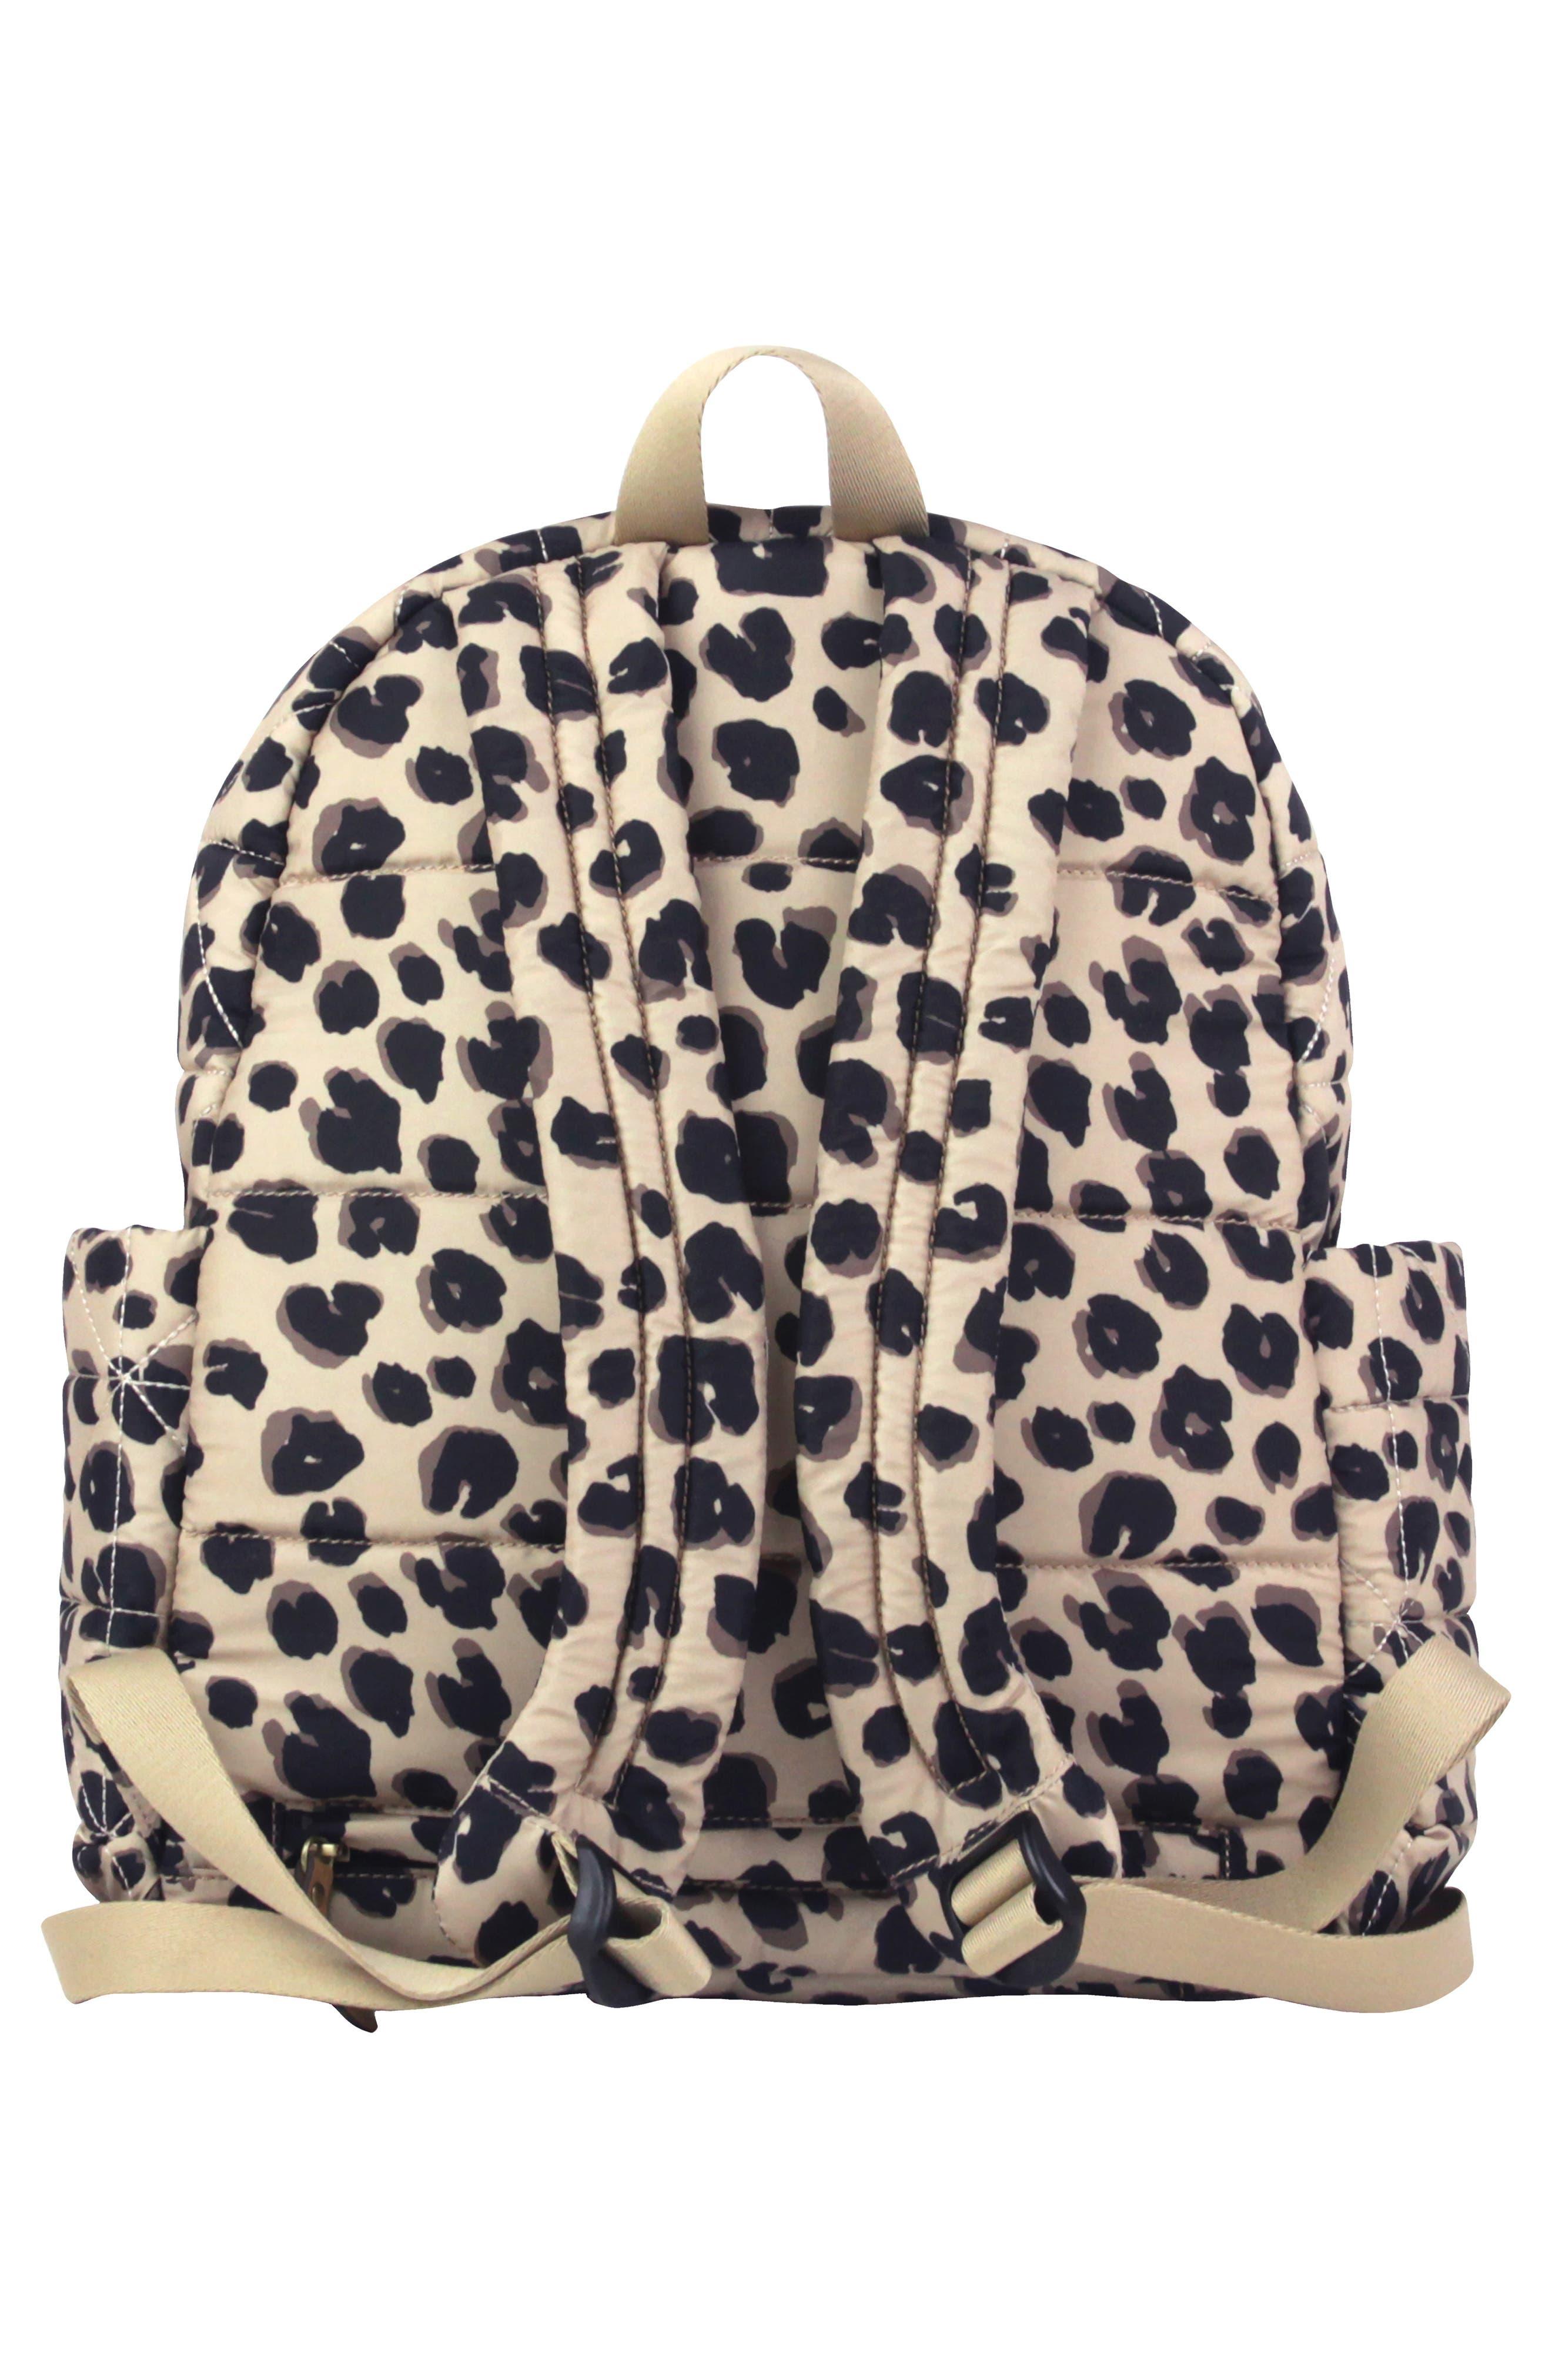 TWELVELITTLE, Quilted Water Resistant Nylon Diaper Backpack, Alternate thumbnail 2, color, LEOPARD PRINT